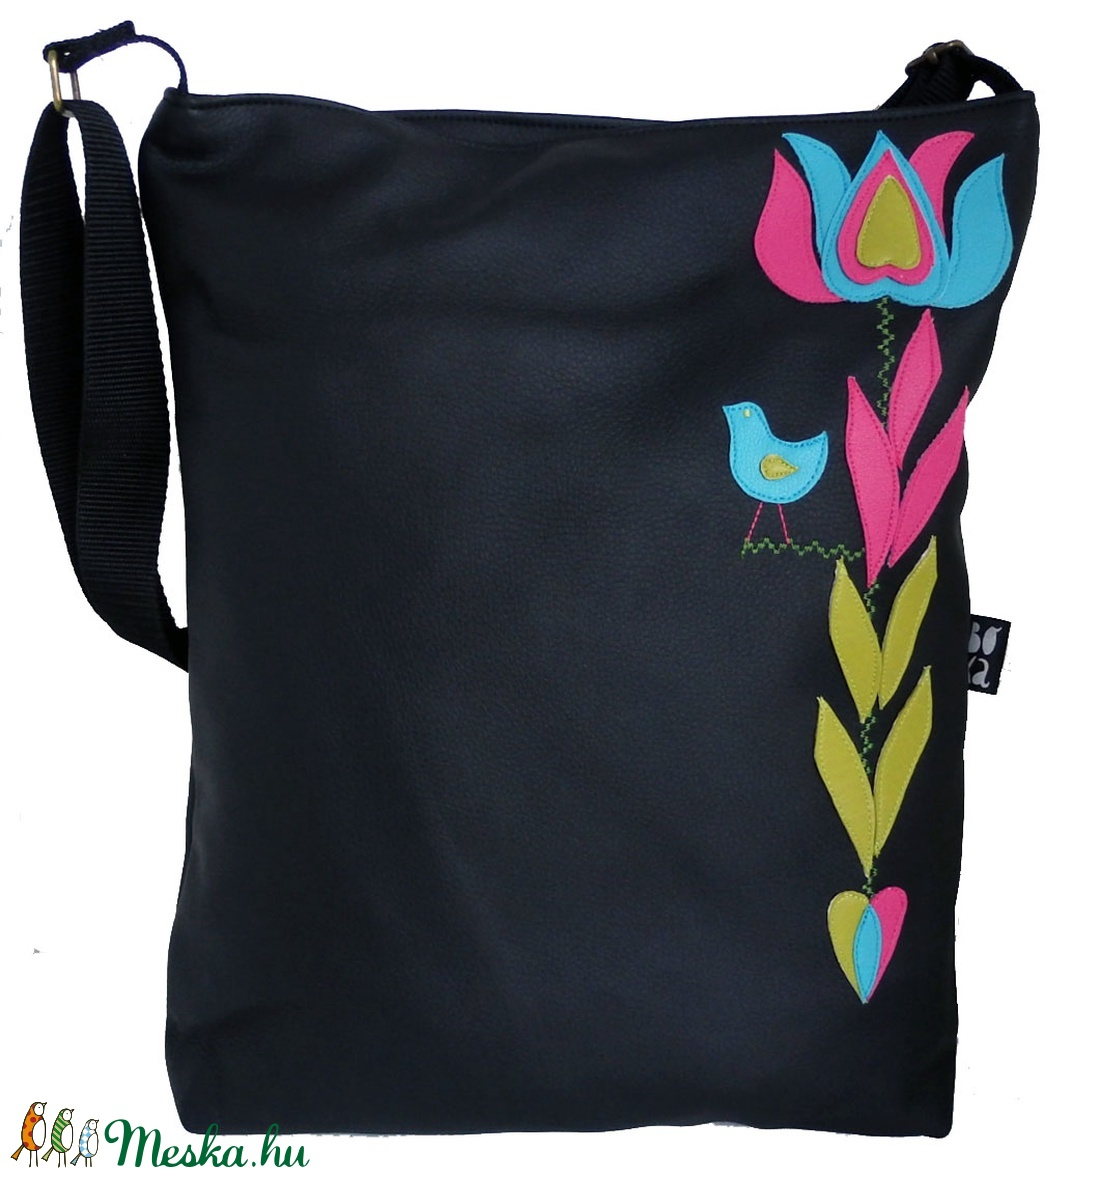 Somogyi virágos táska (fekete) (gubolyka) - Meska.hu